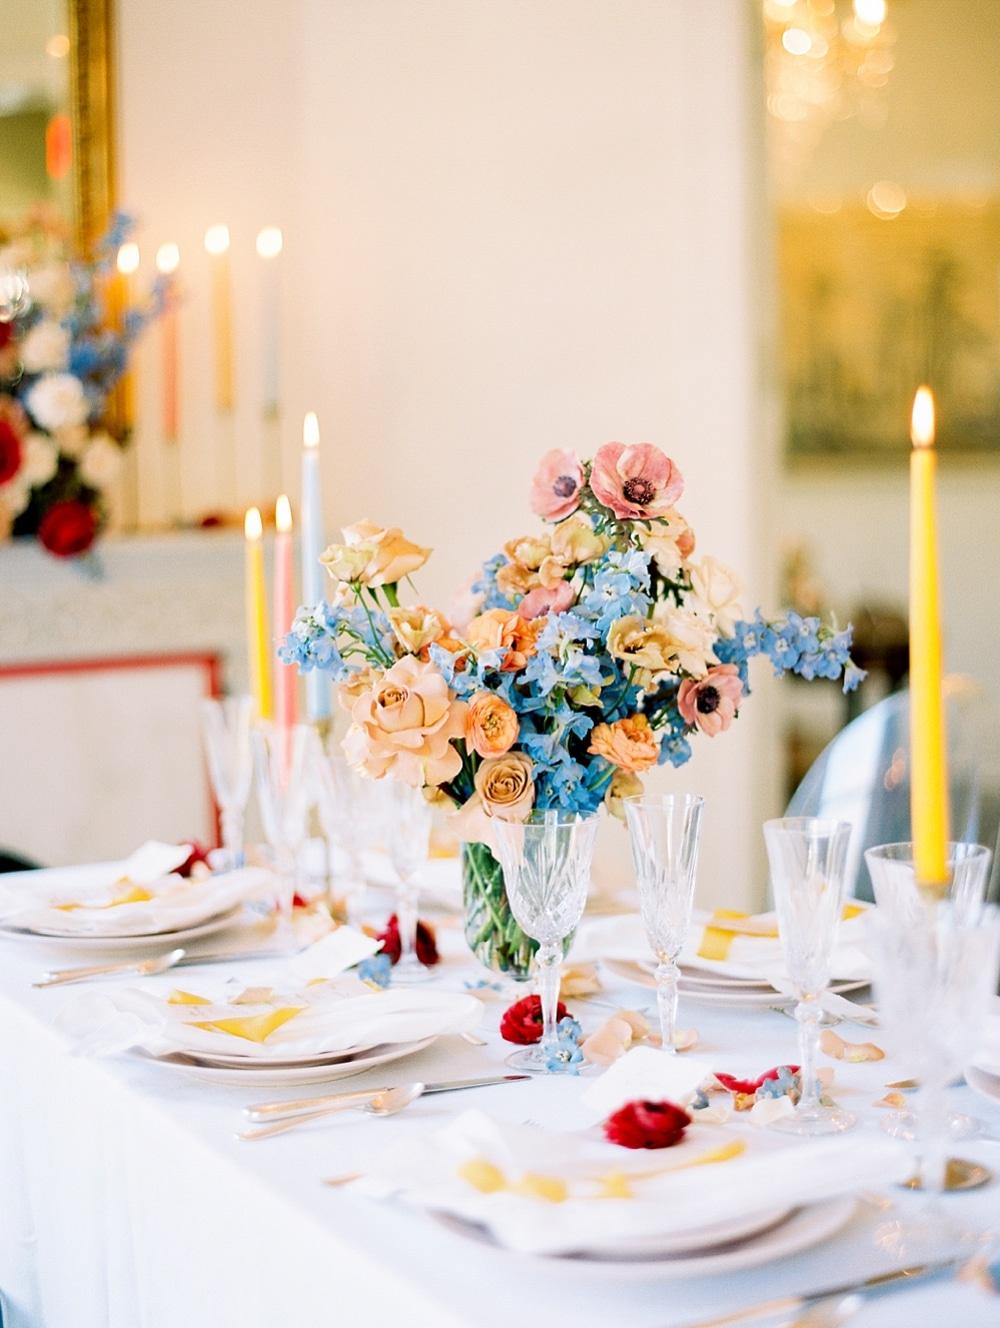 kristin-la-voie-photography-austin-wedding-photographer-woodbine-mansion-211